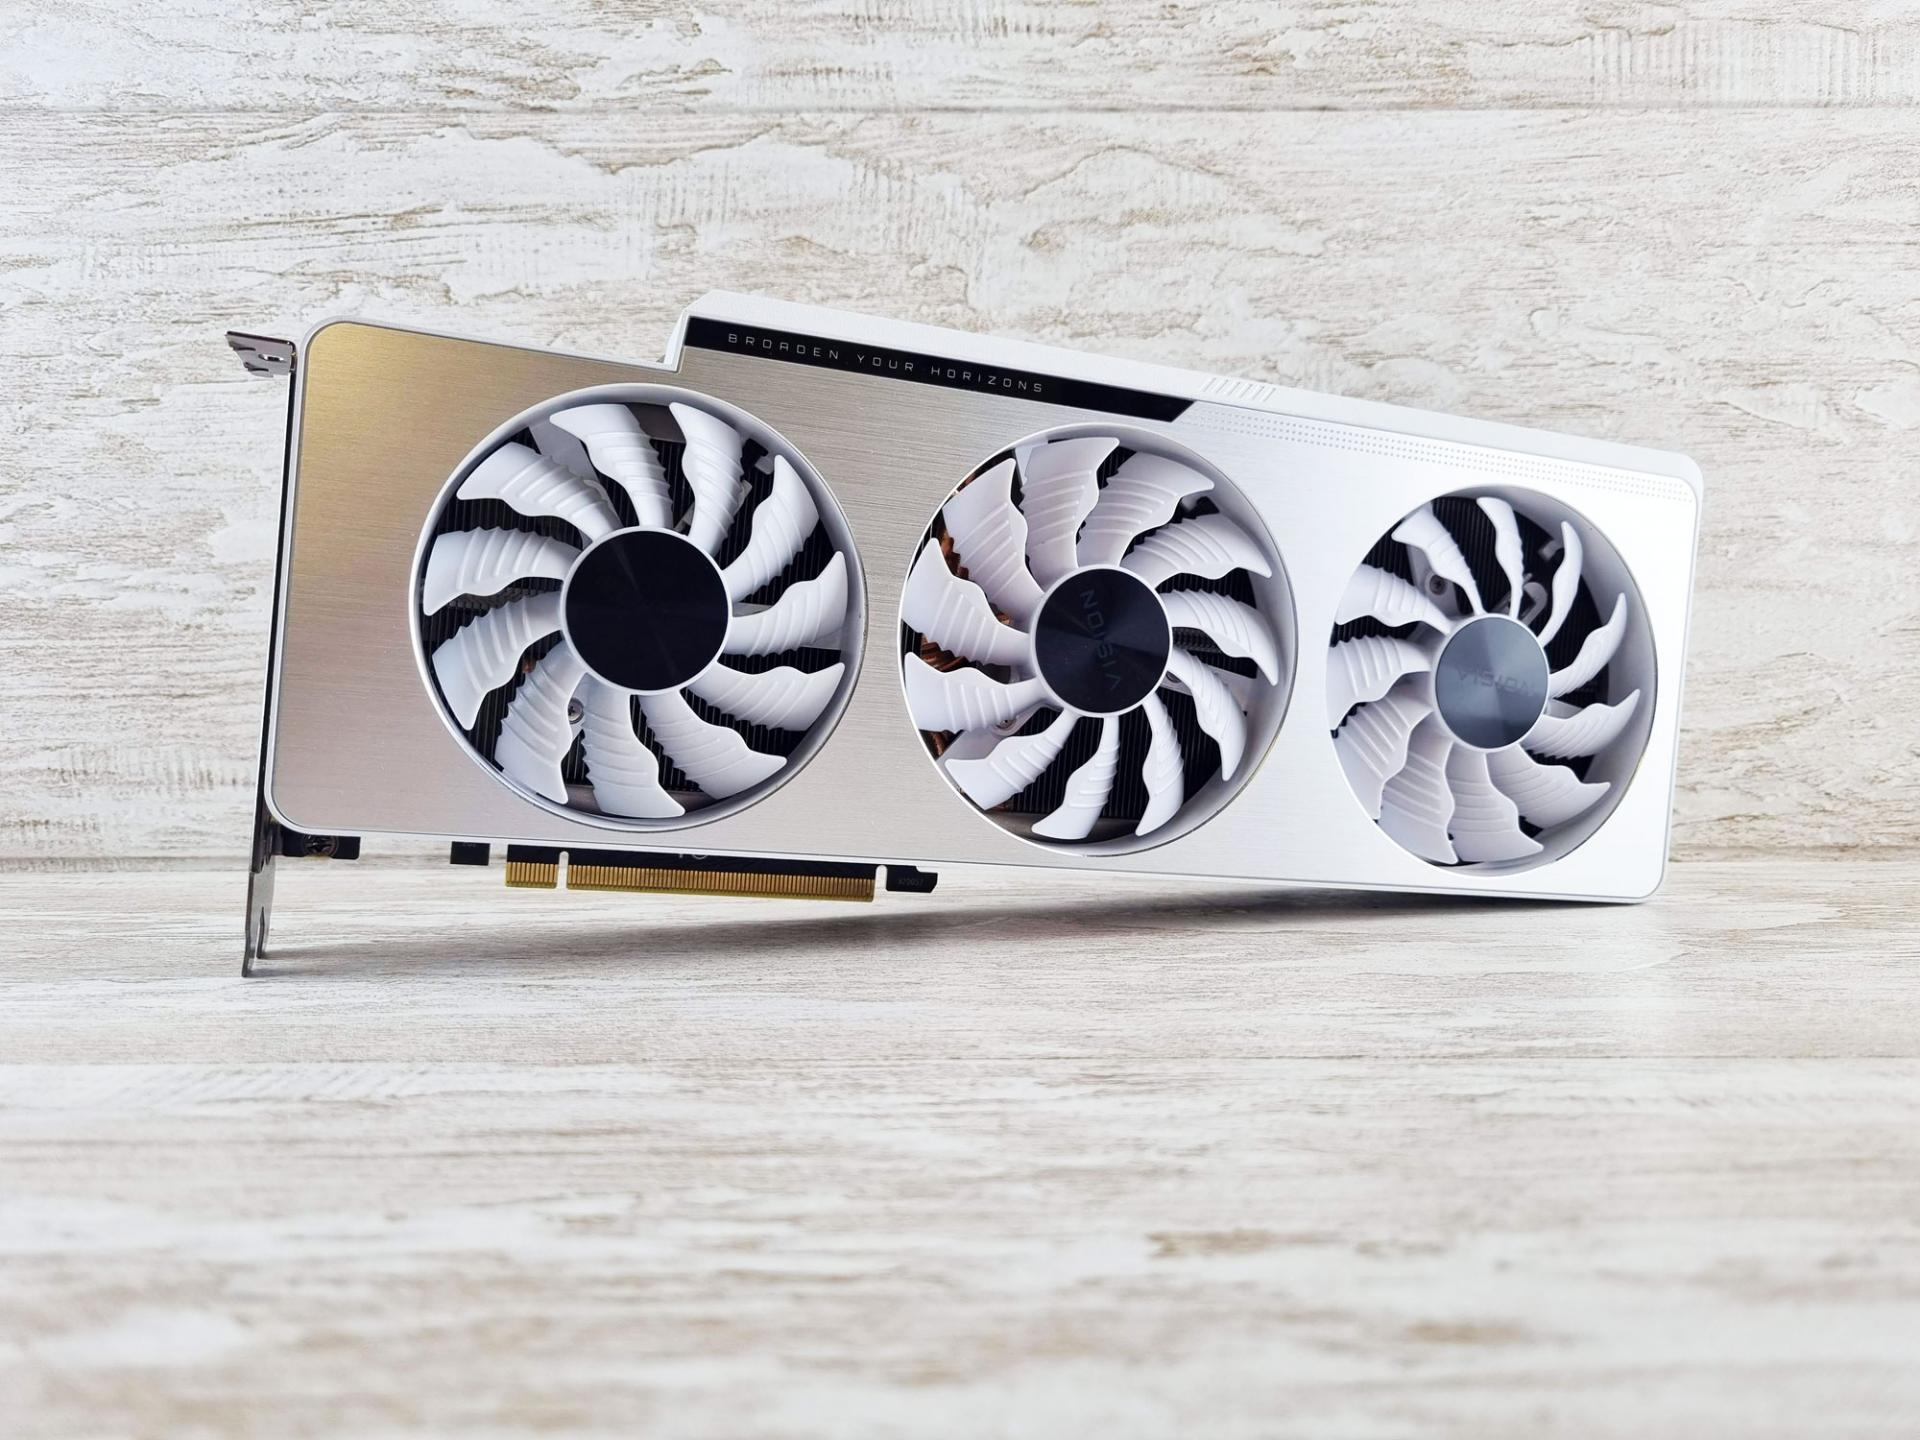 Тест-драйв видеокарты GIGABYTE GeForce RTX 3080 TiVISION OC12G